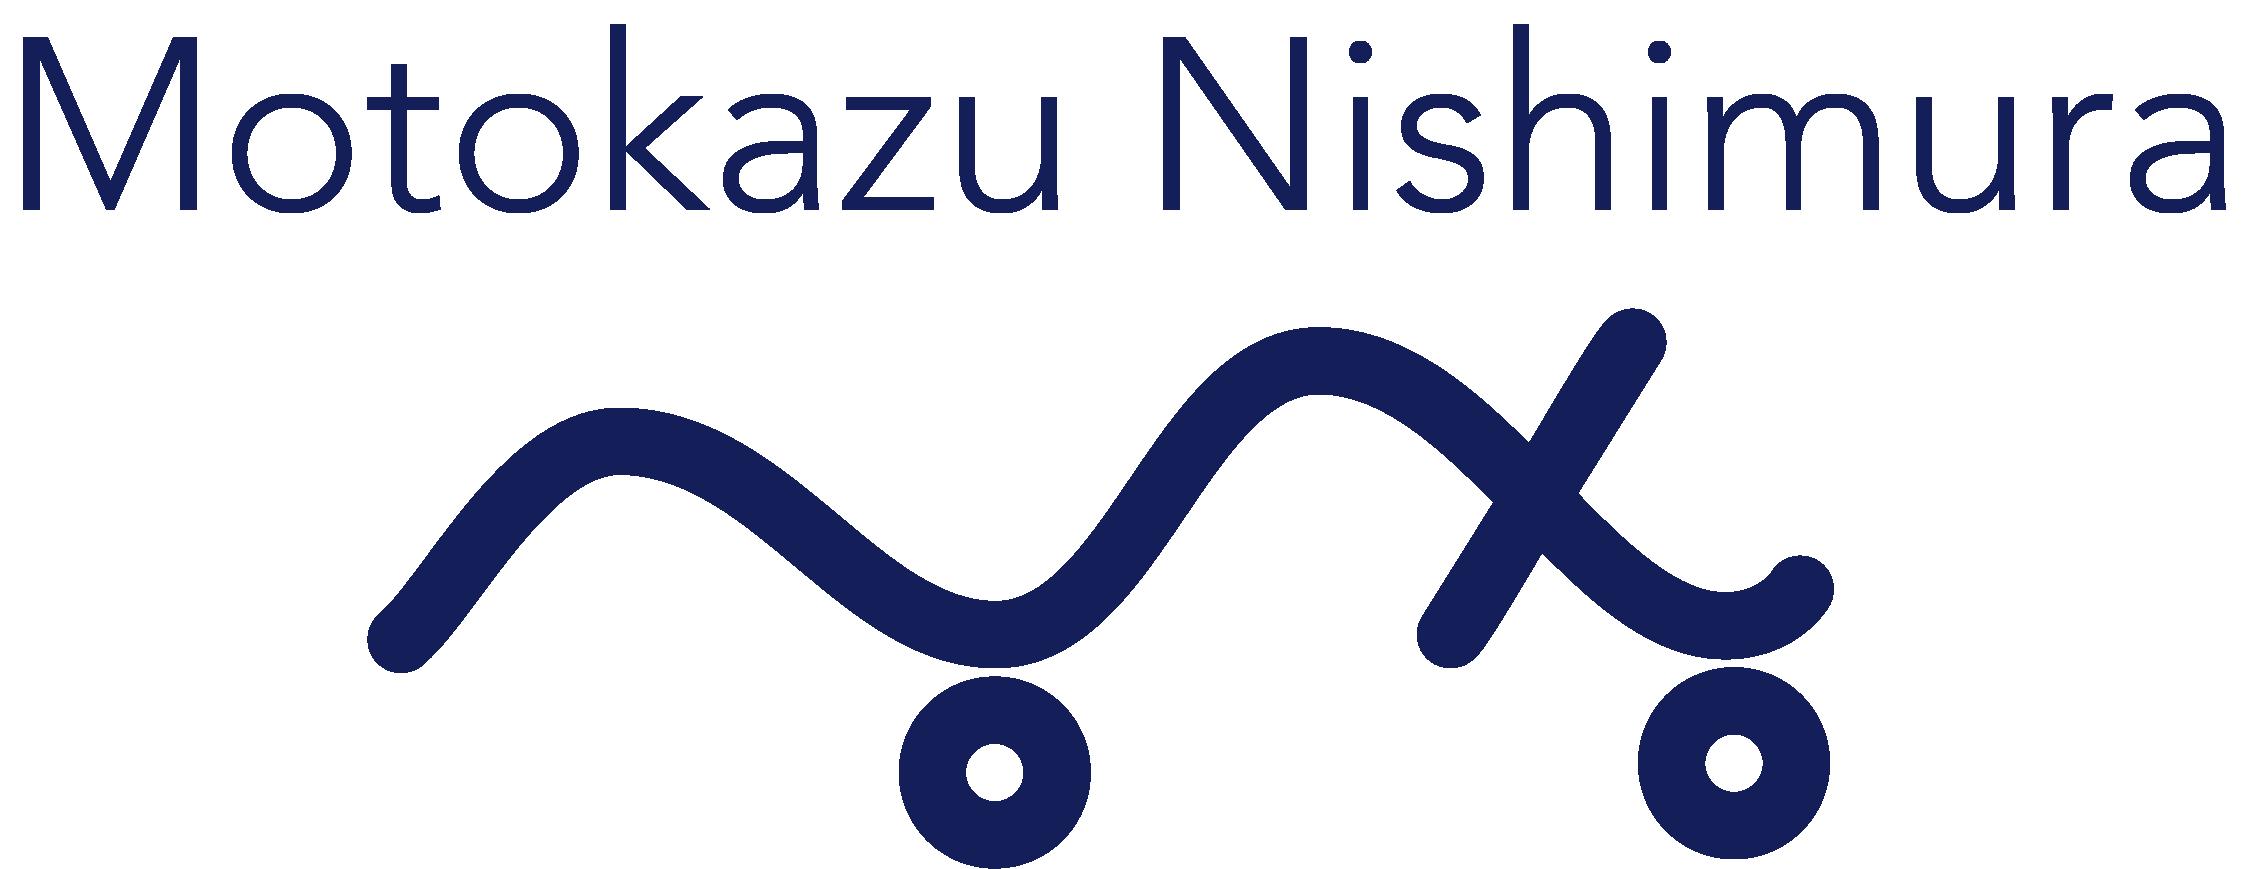 Motokazu Nishimura